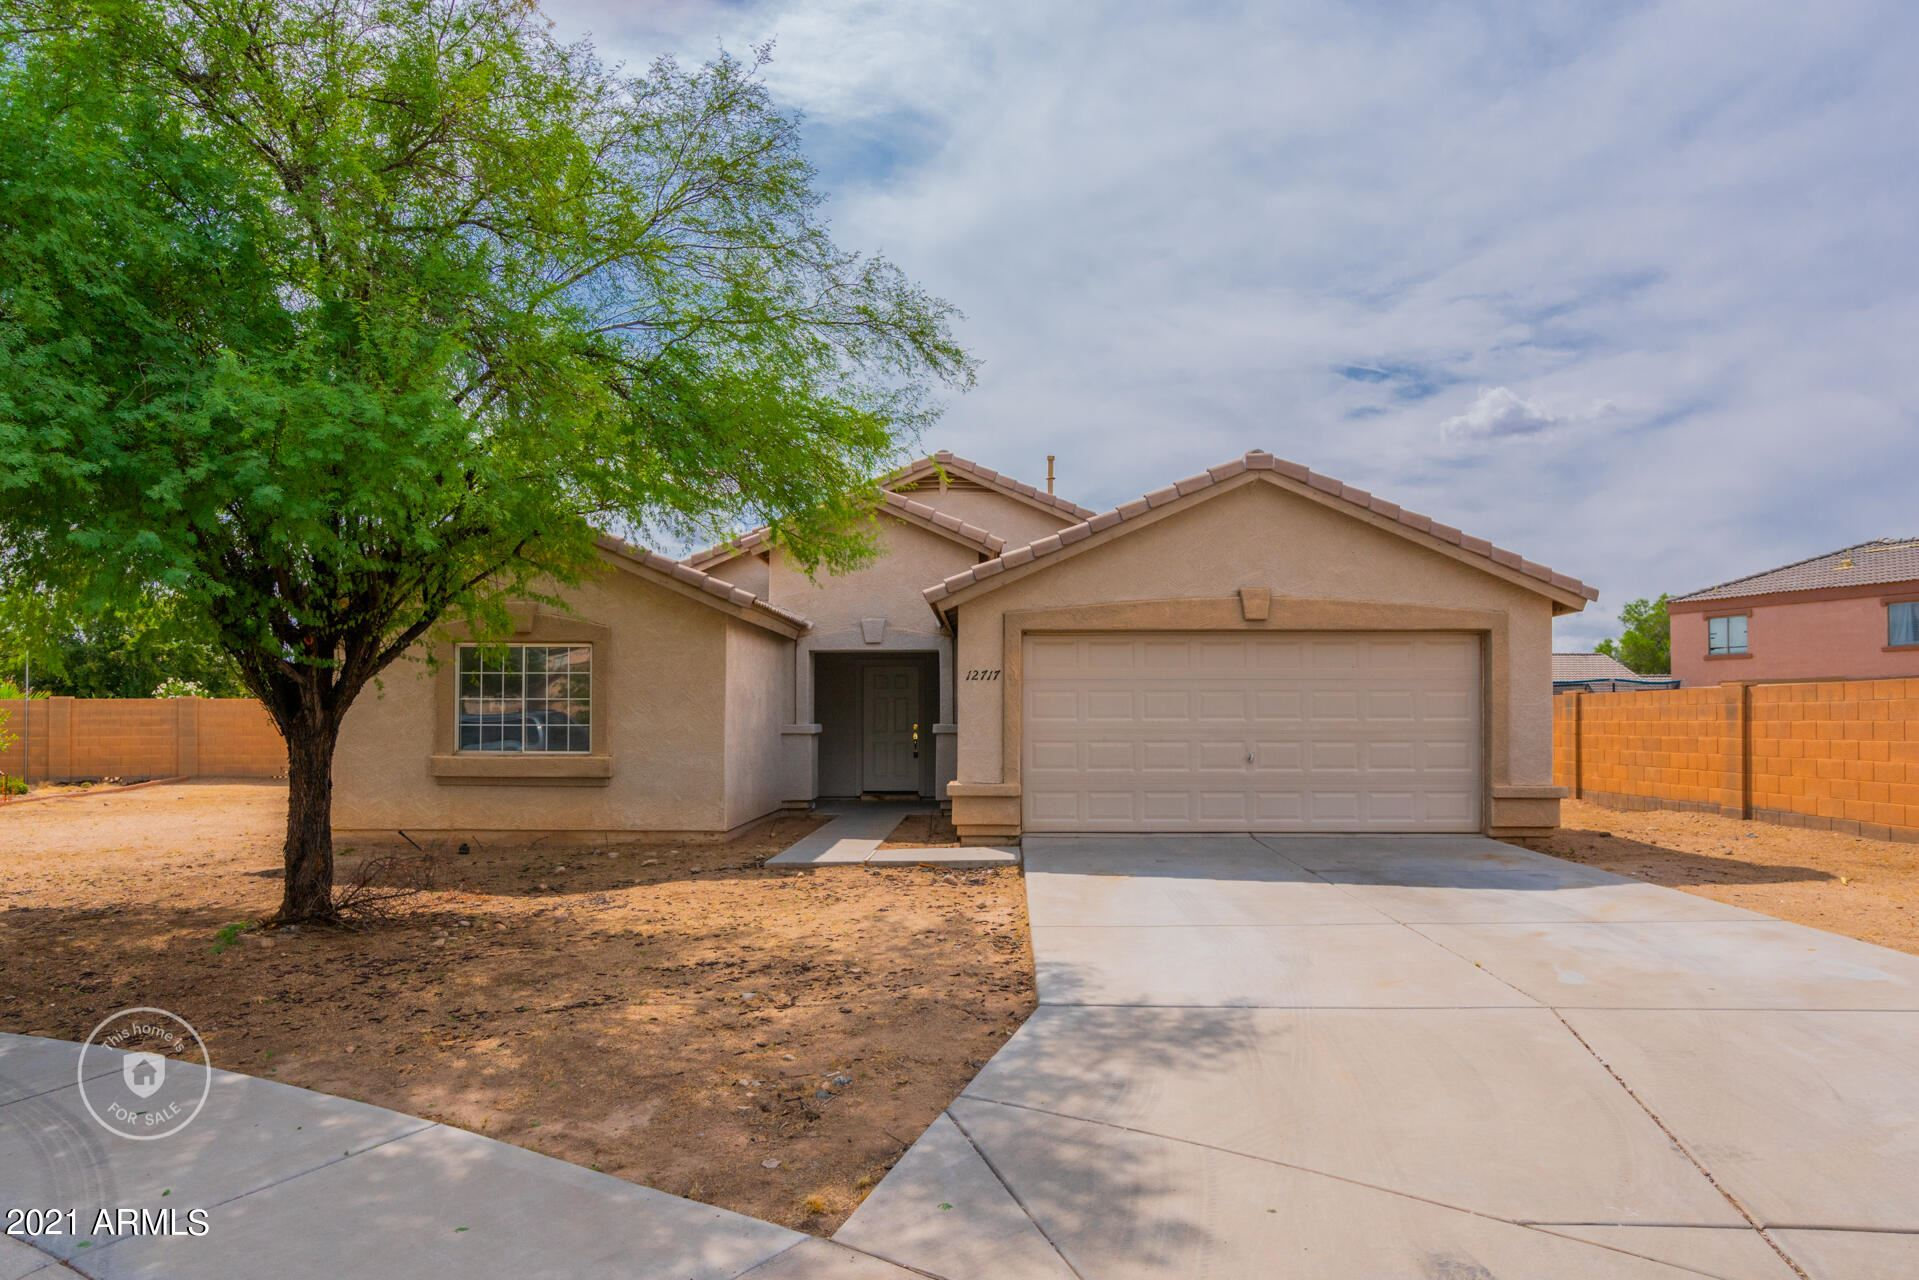 Photo of 12717 W MYER Lane, El Mirage, AZ 85335 (MLS # 6301480)